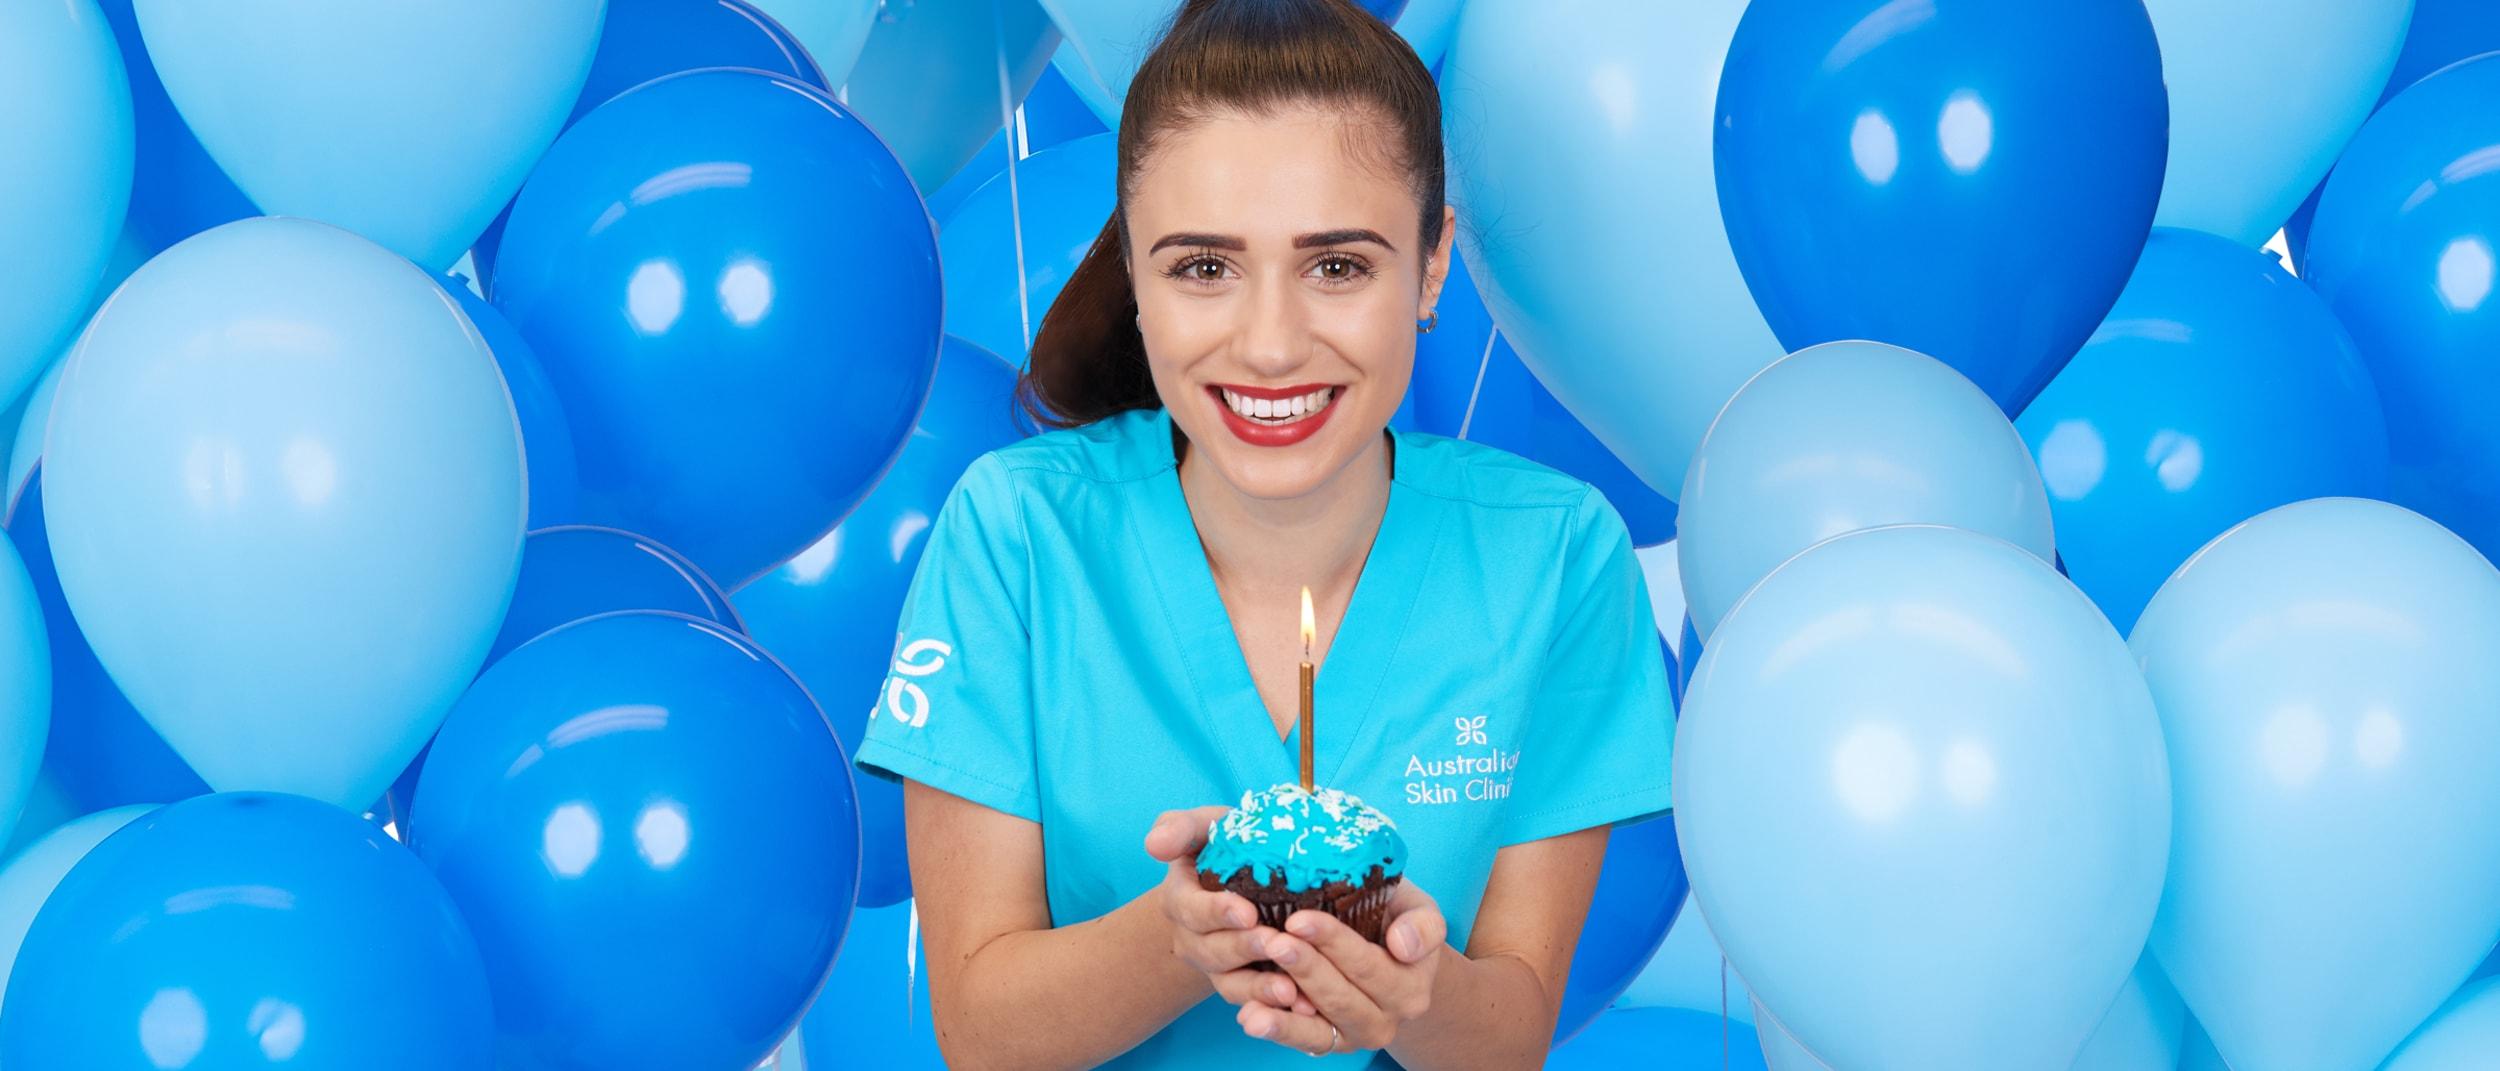 Australian Skin Clinics: it's our birthday sale